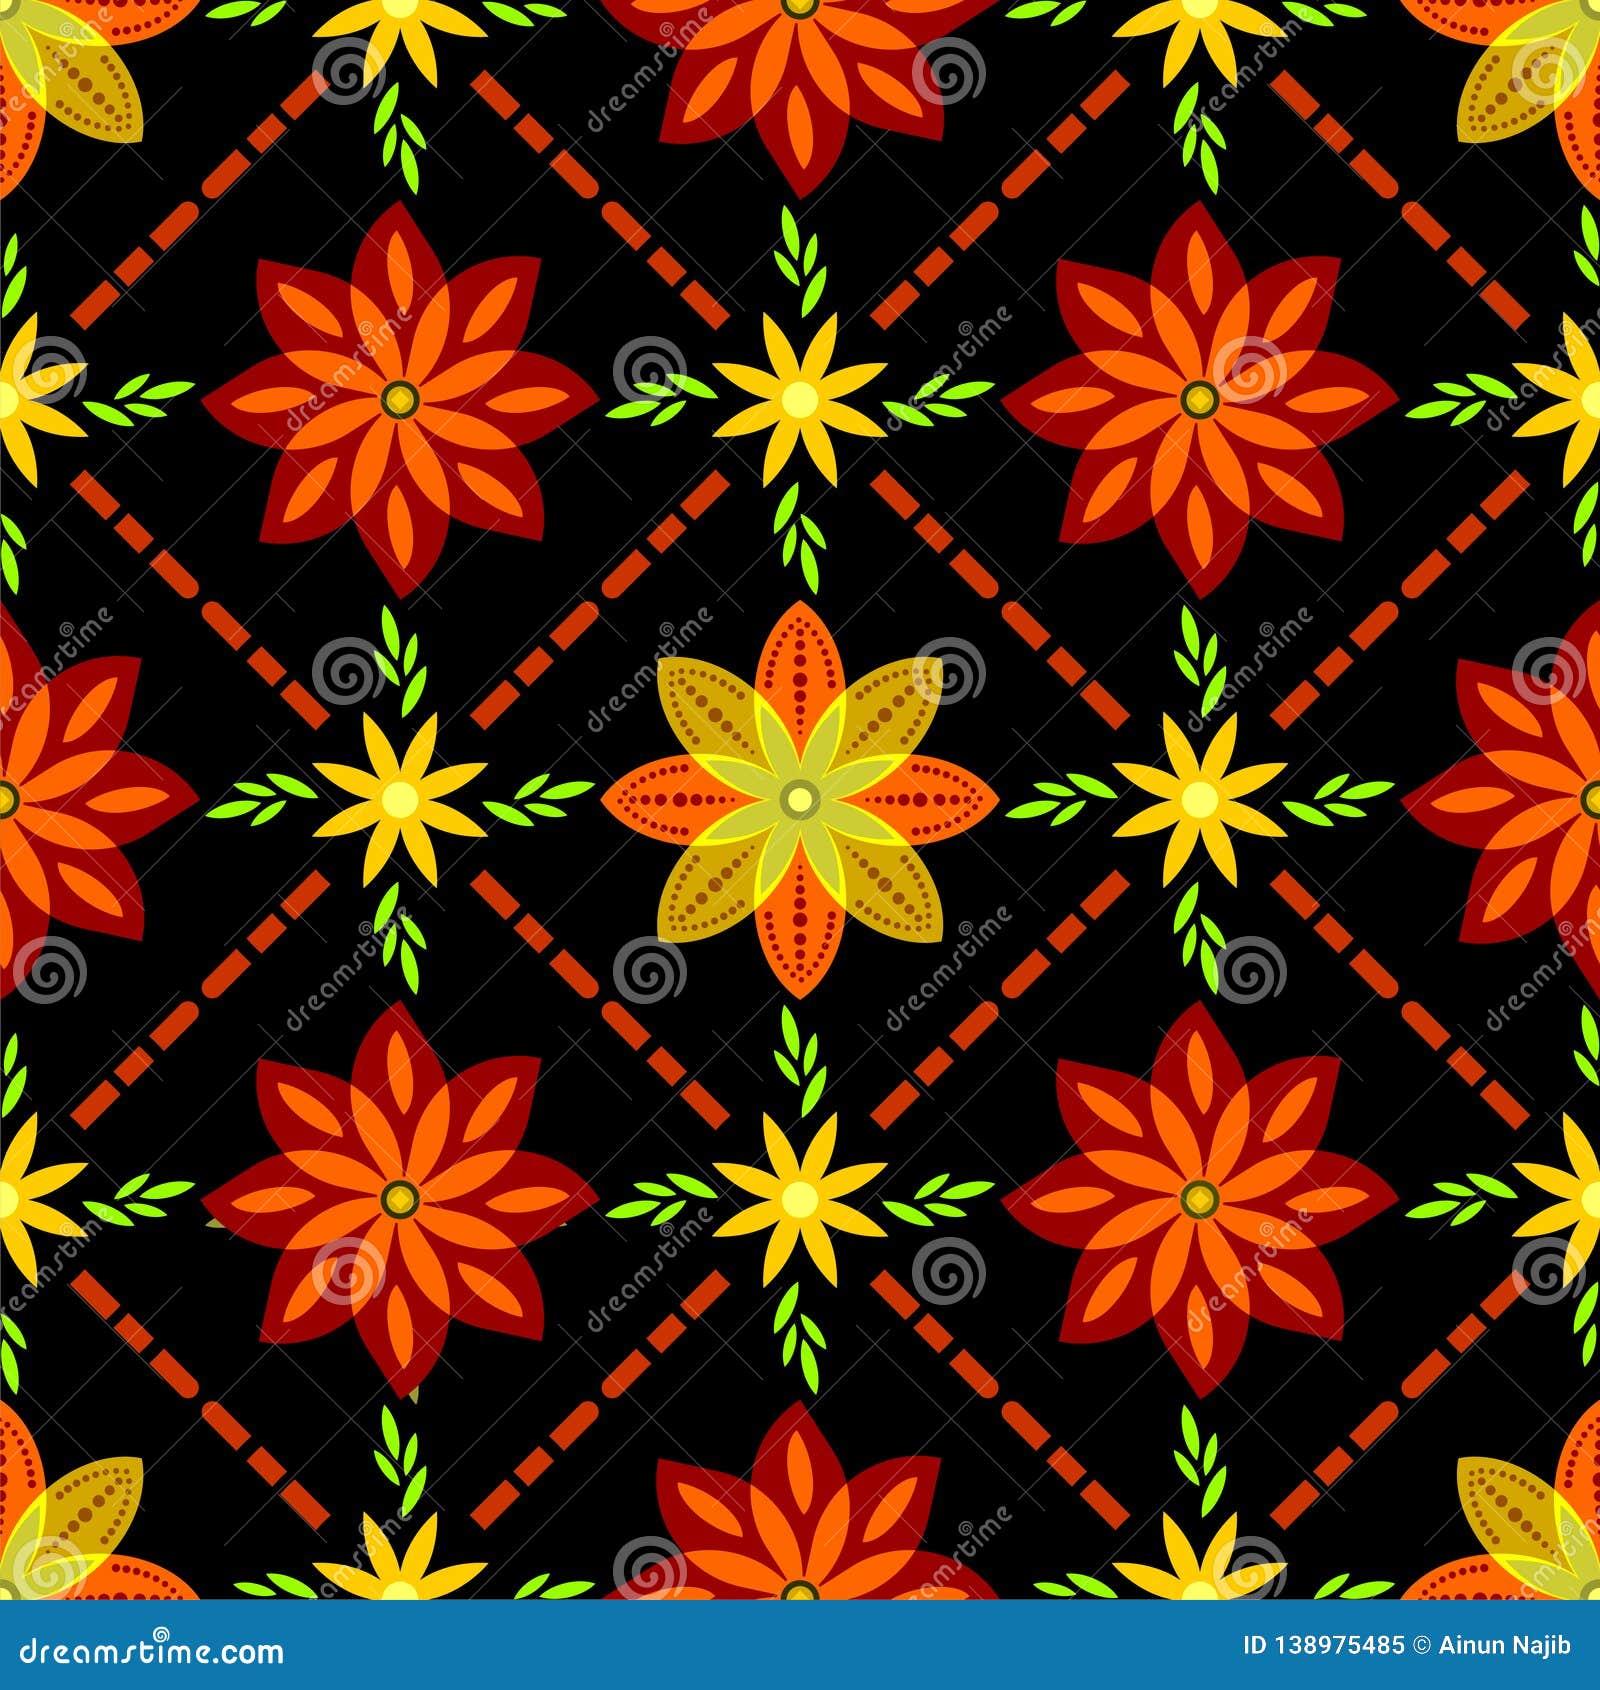 Flower Pattern On Batik With Black Background Stock